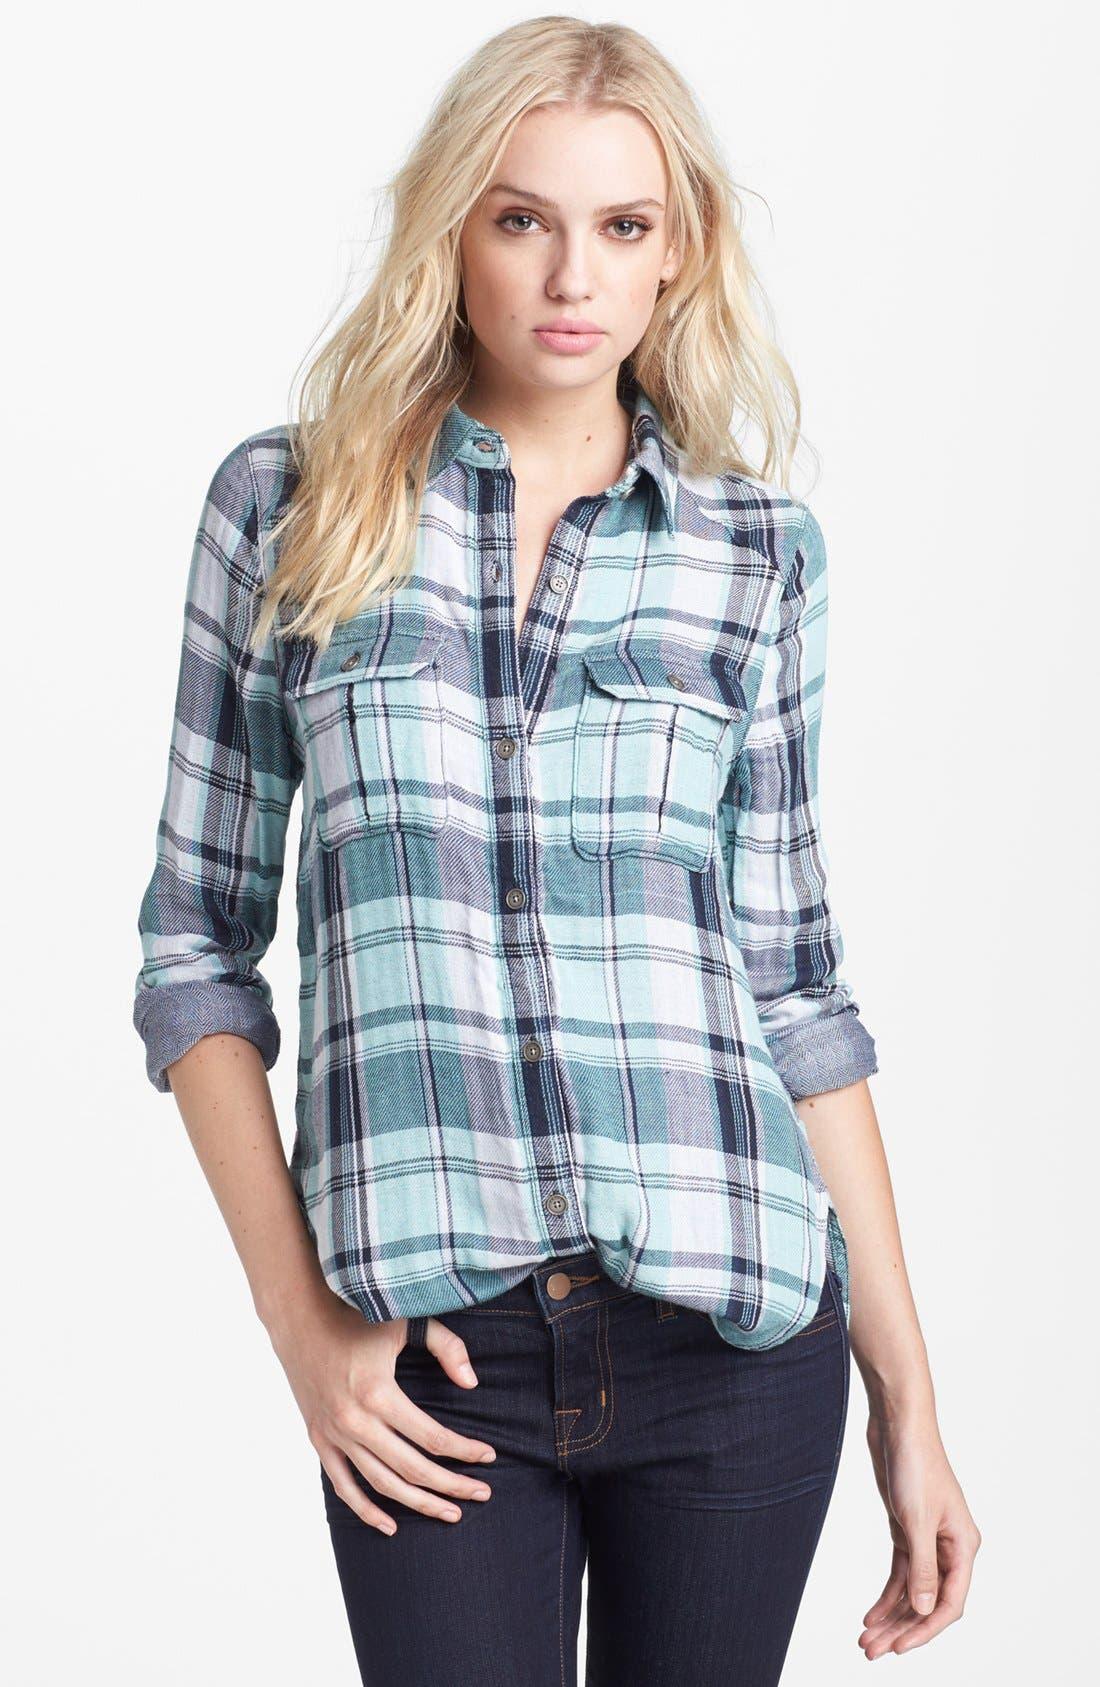 Alternate Image 1 Selected - Paige Denim 'Kadie' Plaid Shirt